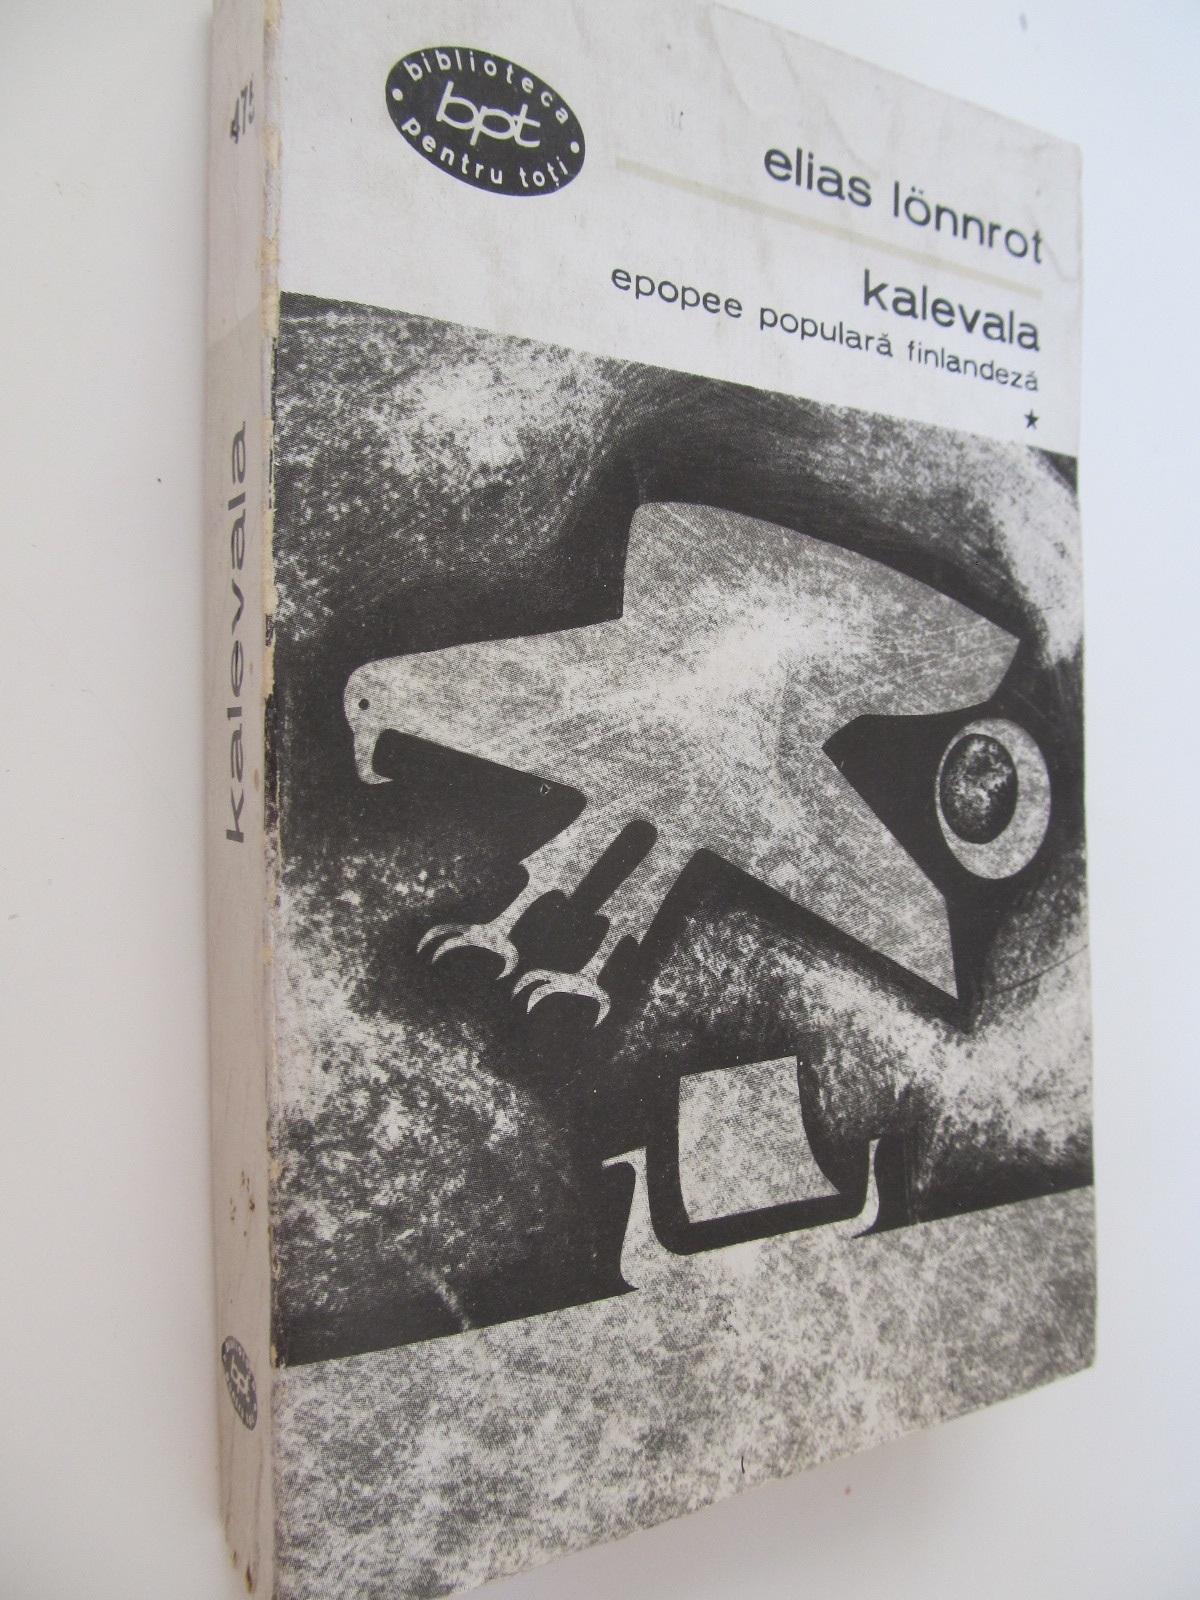 Kalevala (vol. 1) - Epopee populara finlandeza - Elias Lonnrot | Detalii carte